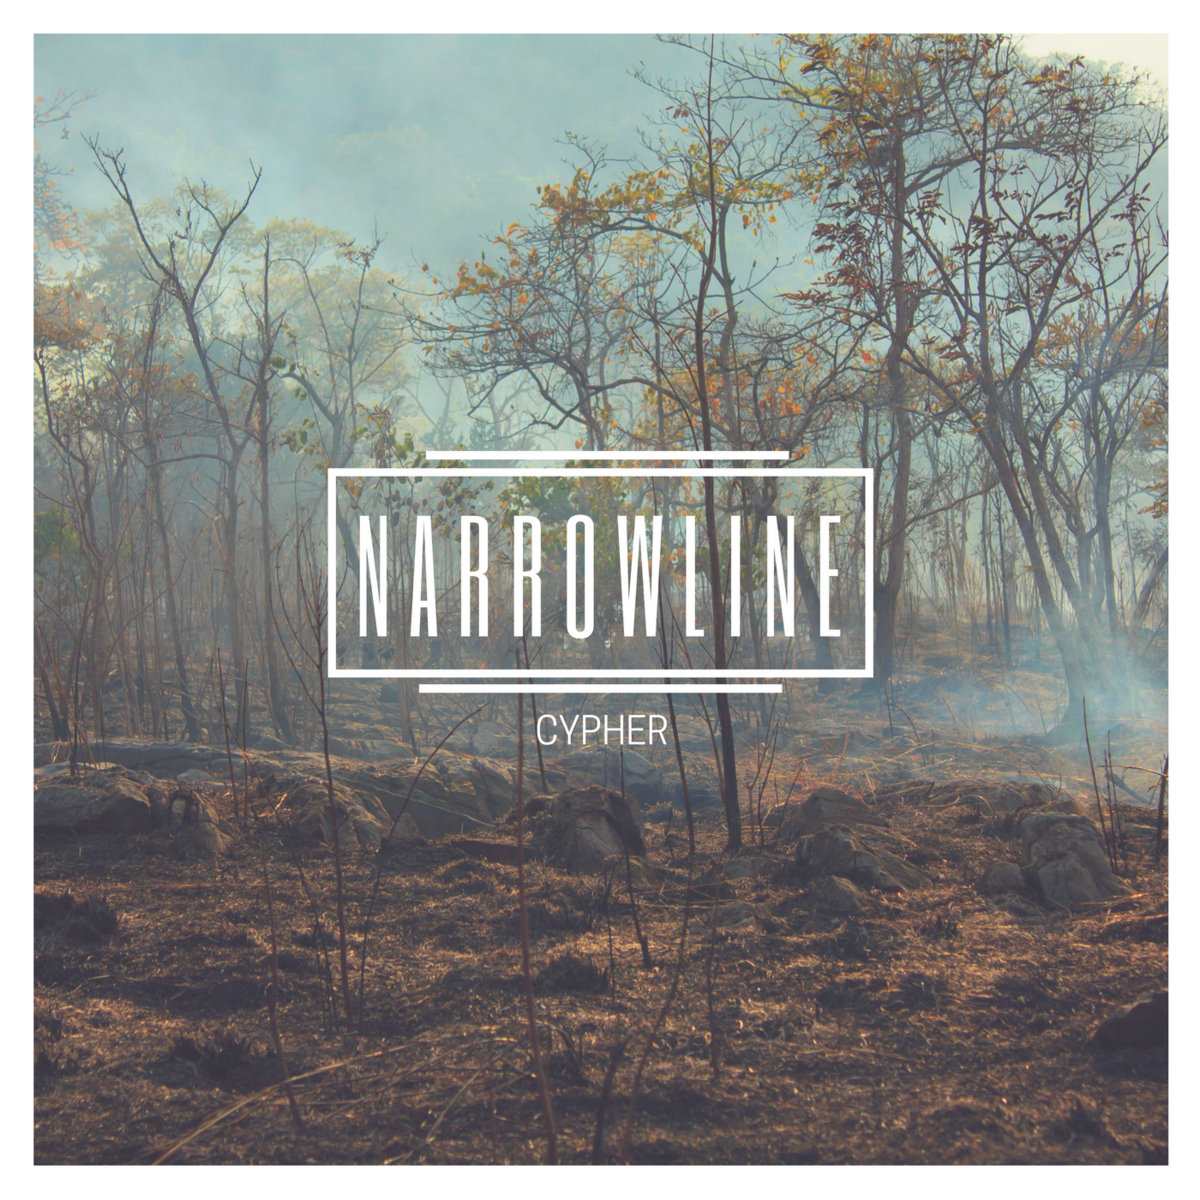 Narrowline - Cypher (2016)